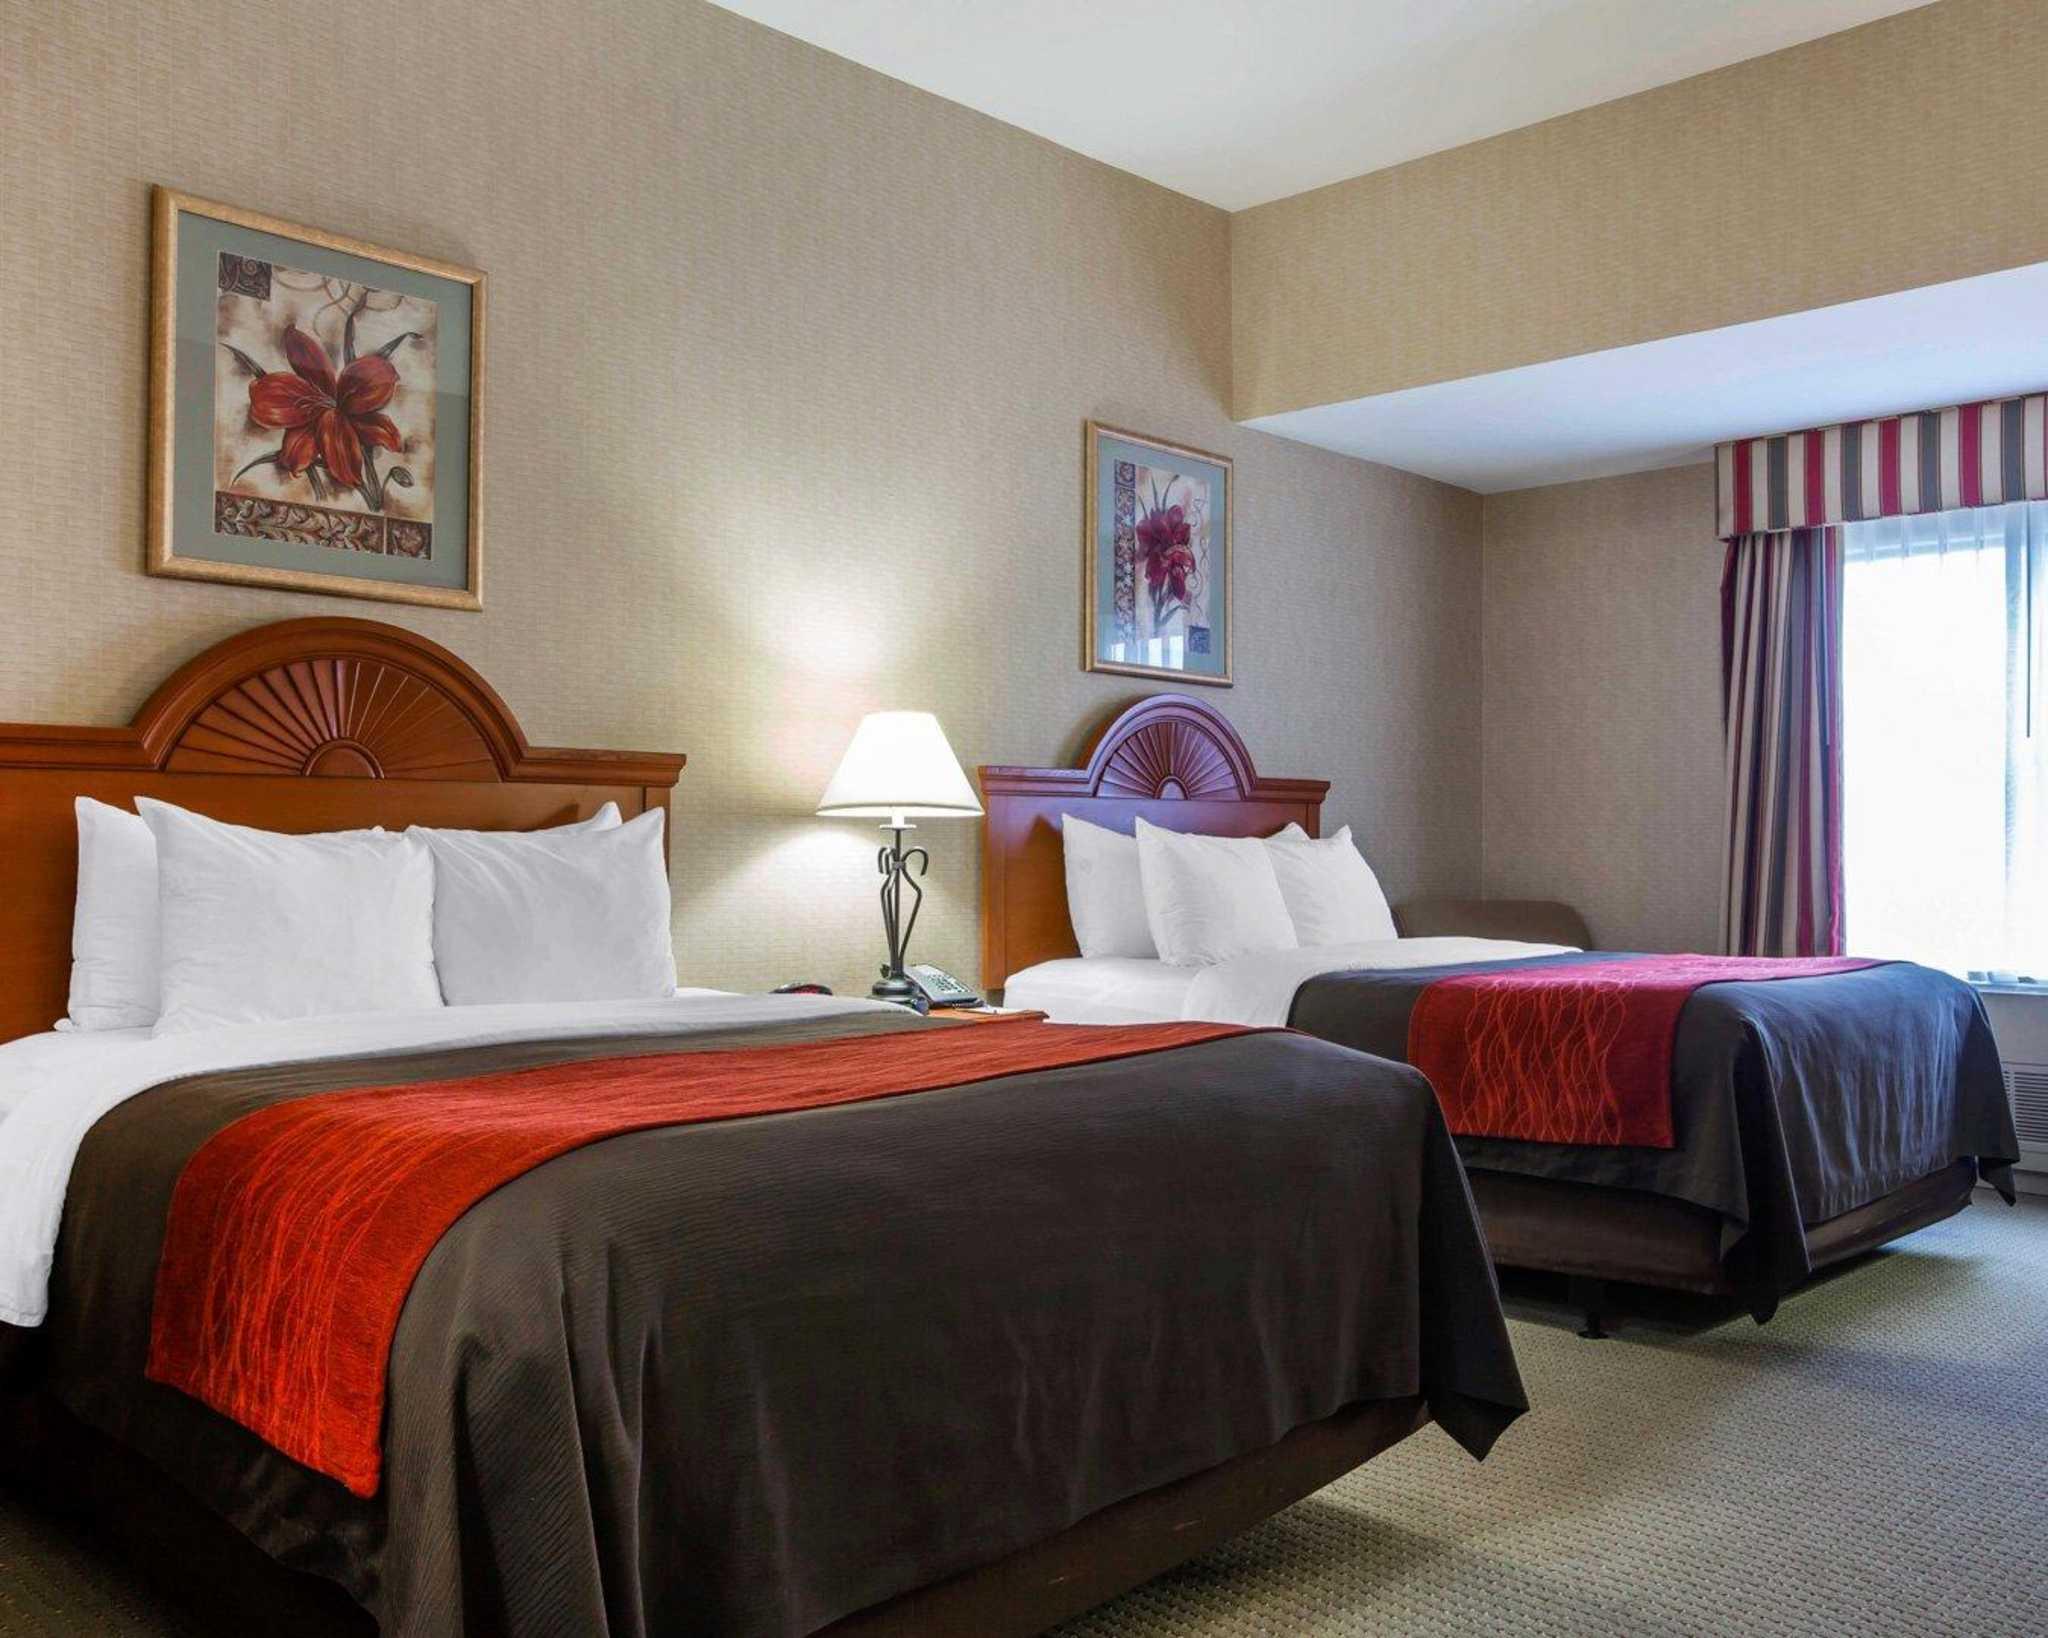 Comfort Inn & Suites adj to Akwesasne Mohawk Casino image 6